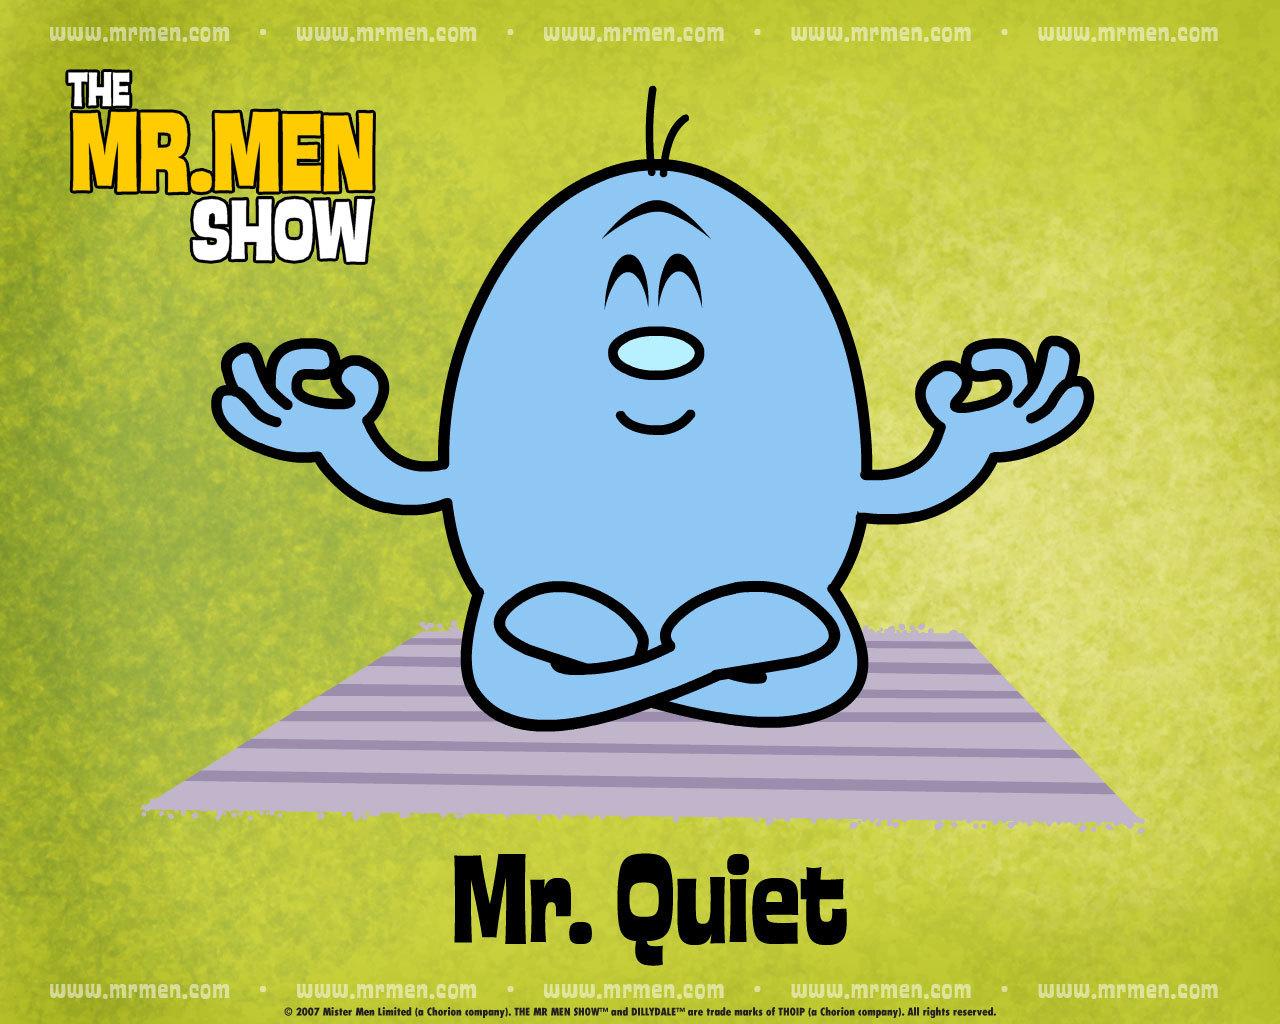 Mr. Man (website)